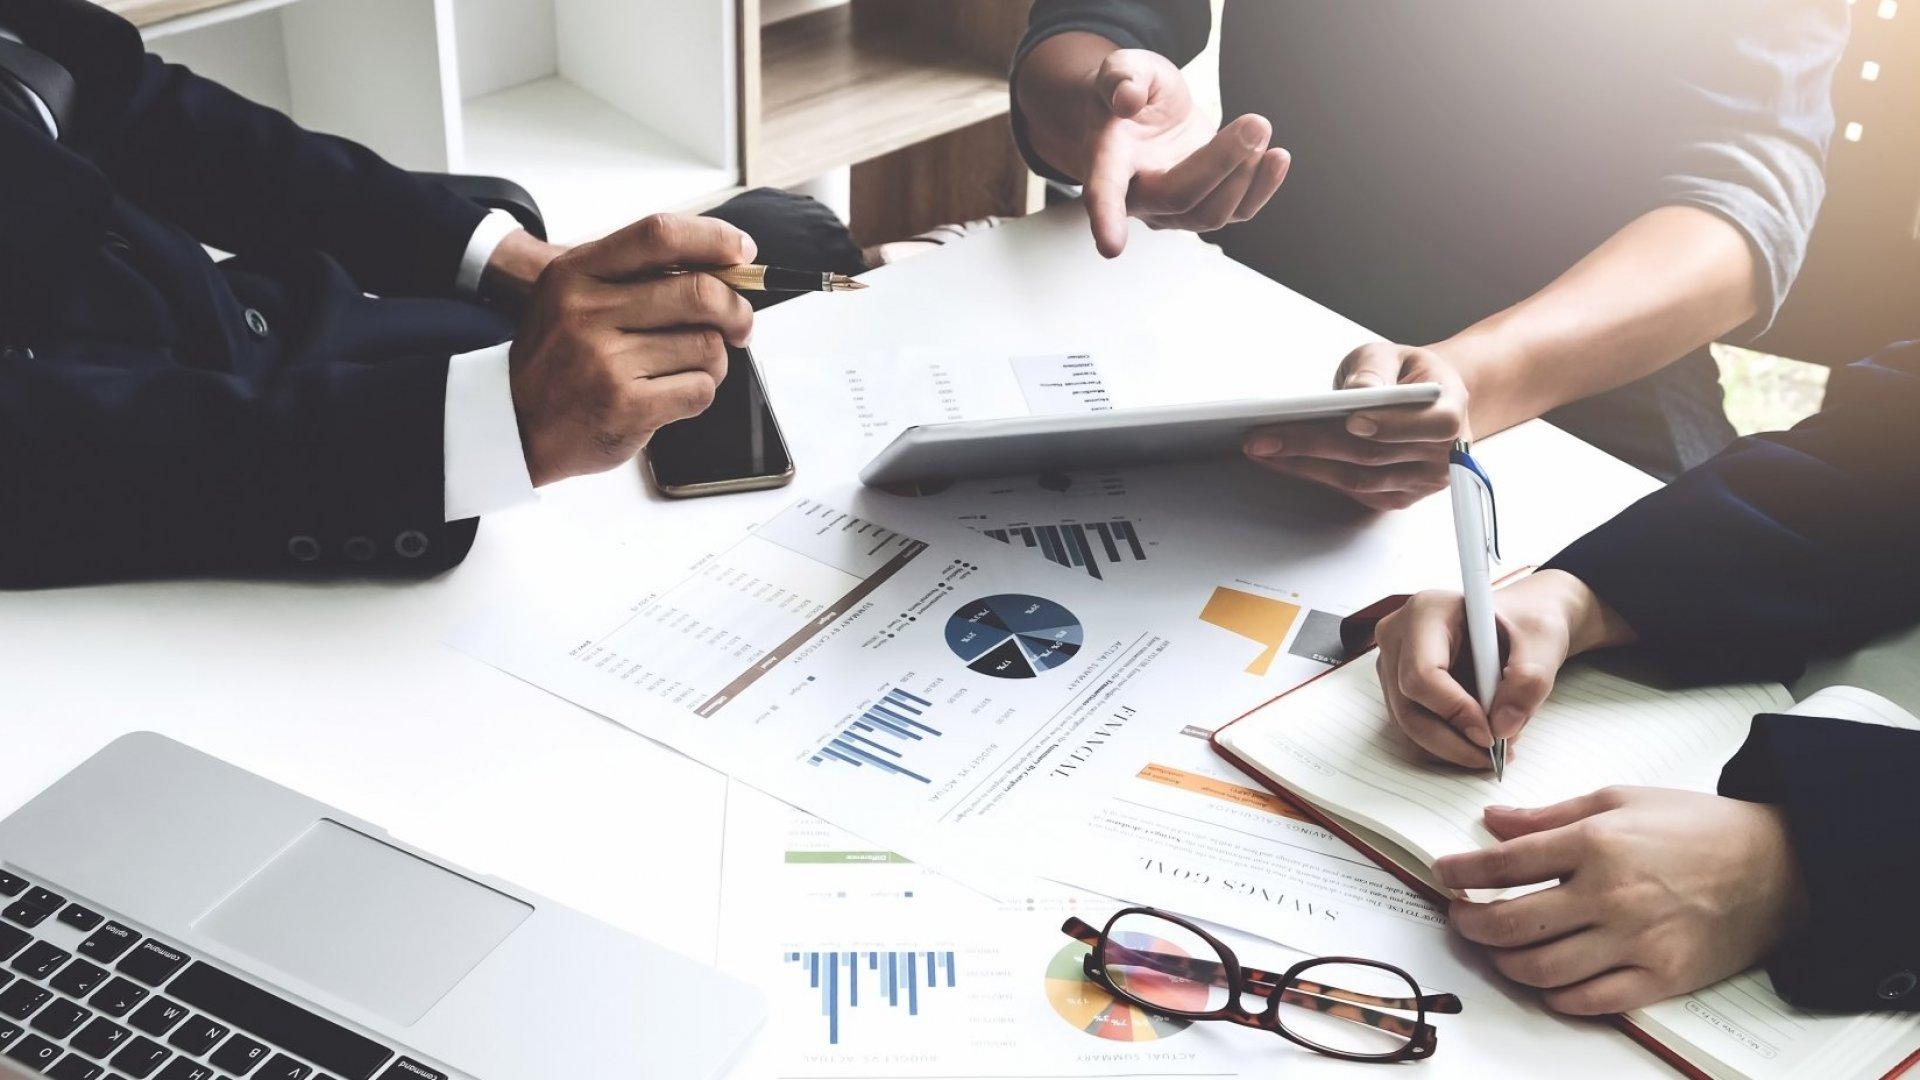 4 Proven Employee Performance Development Techniques